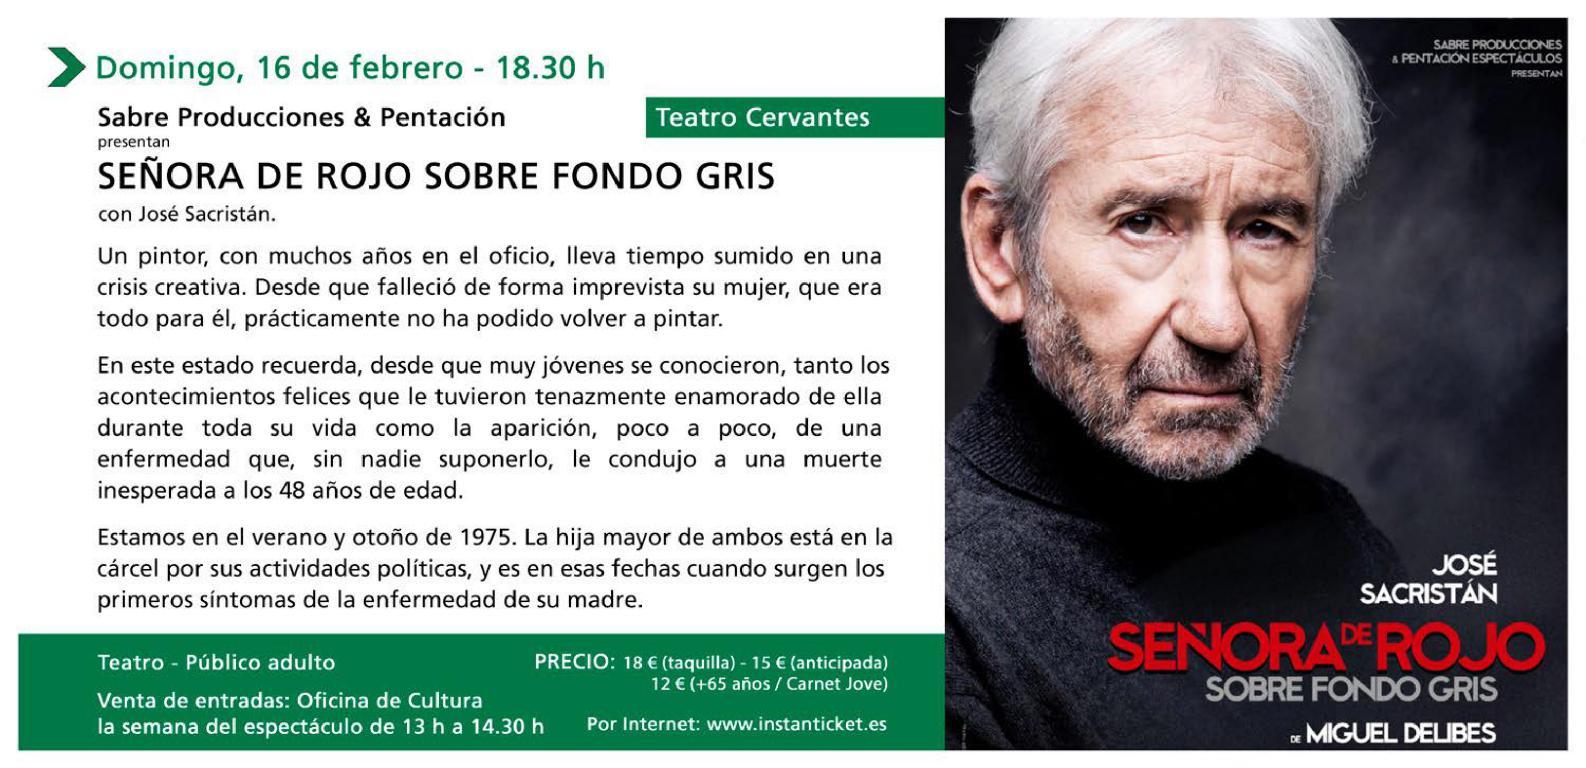 Programacin-Teatro-Cervantes-2020_page-0006.jpg